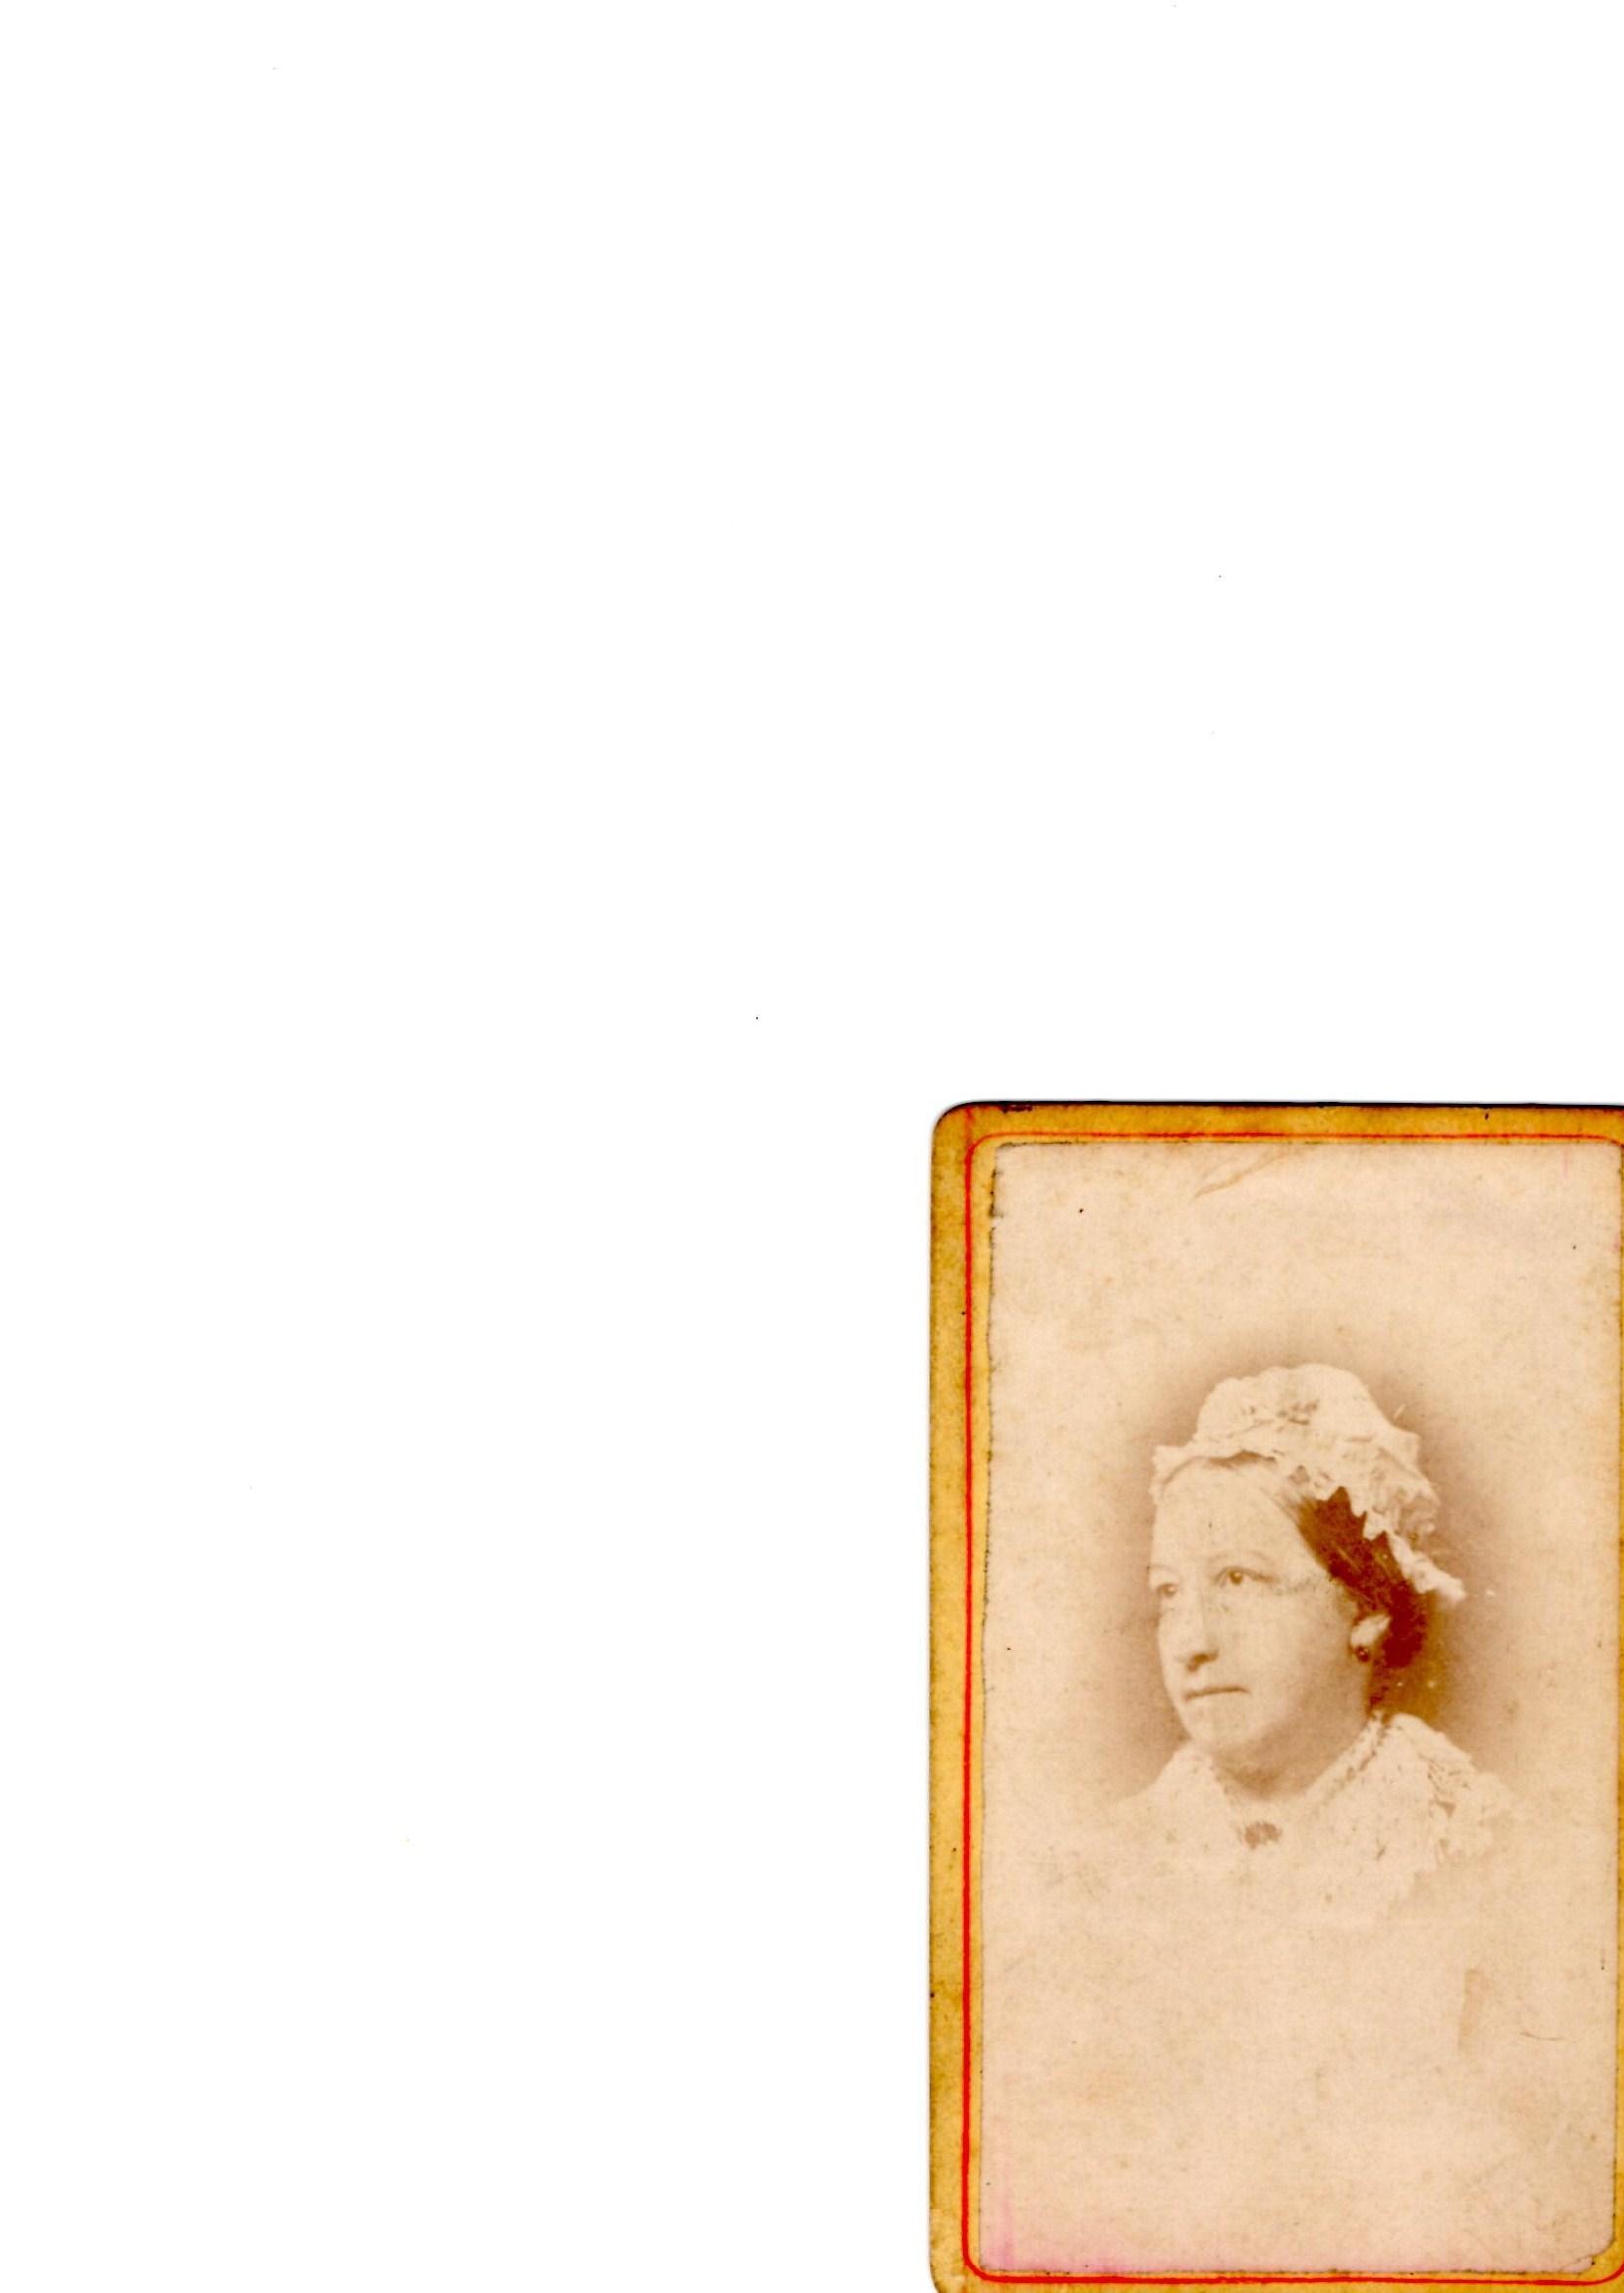 Eliza Turner